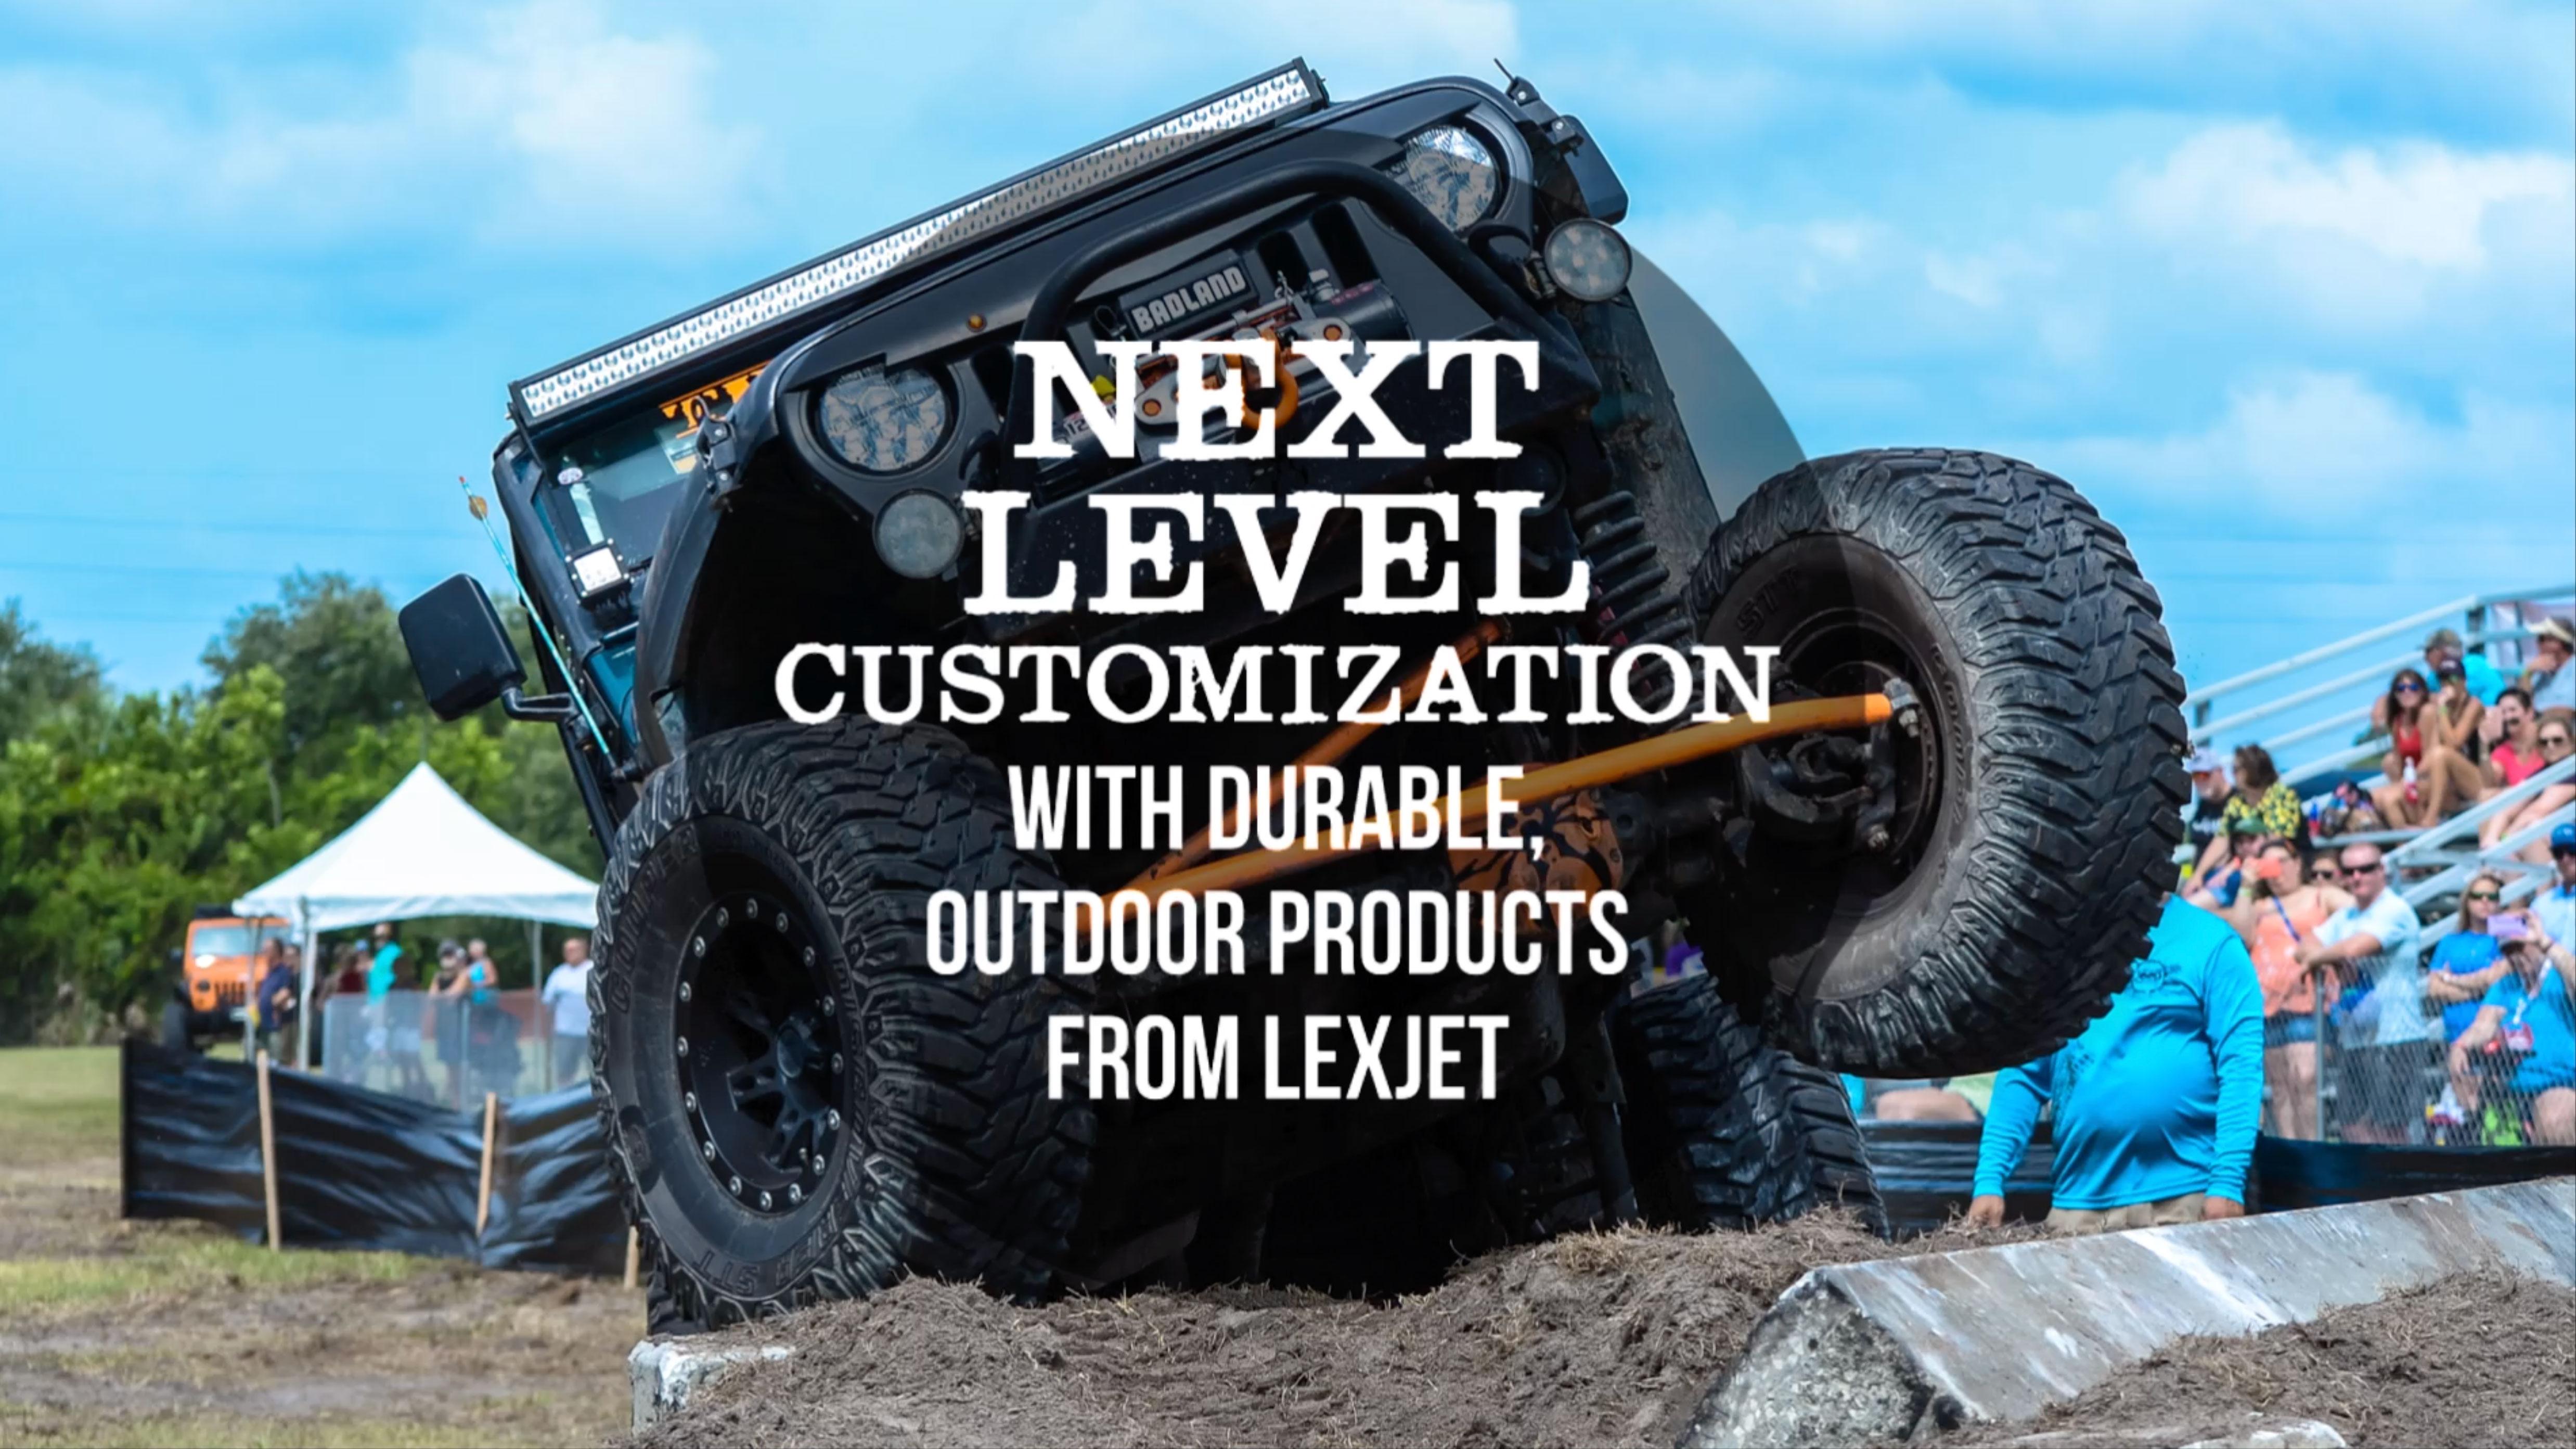 LexJet-brandUP_Suncoast-Jeep-Festival_Final